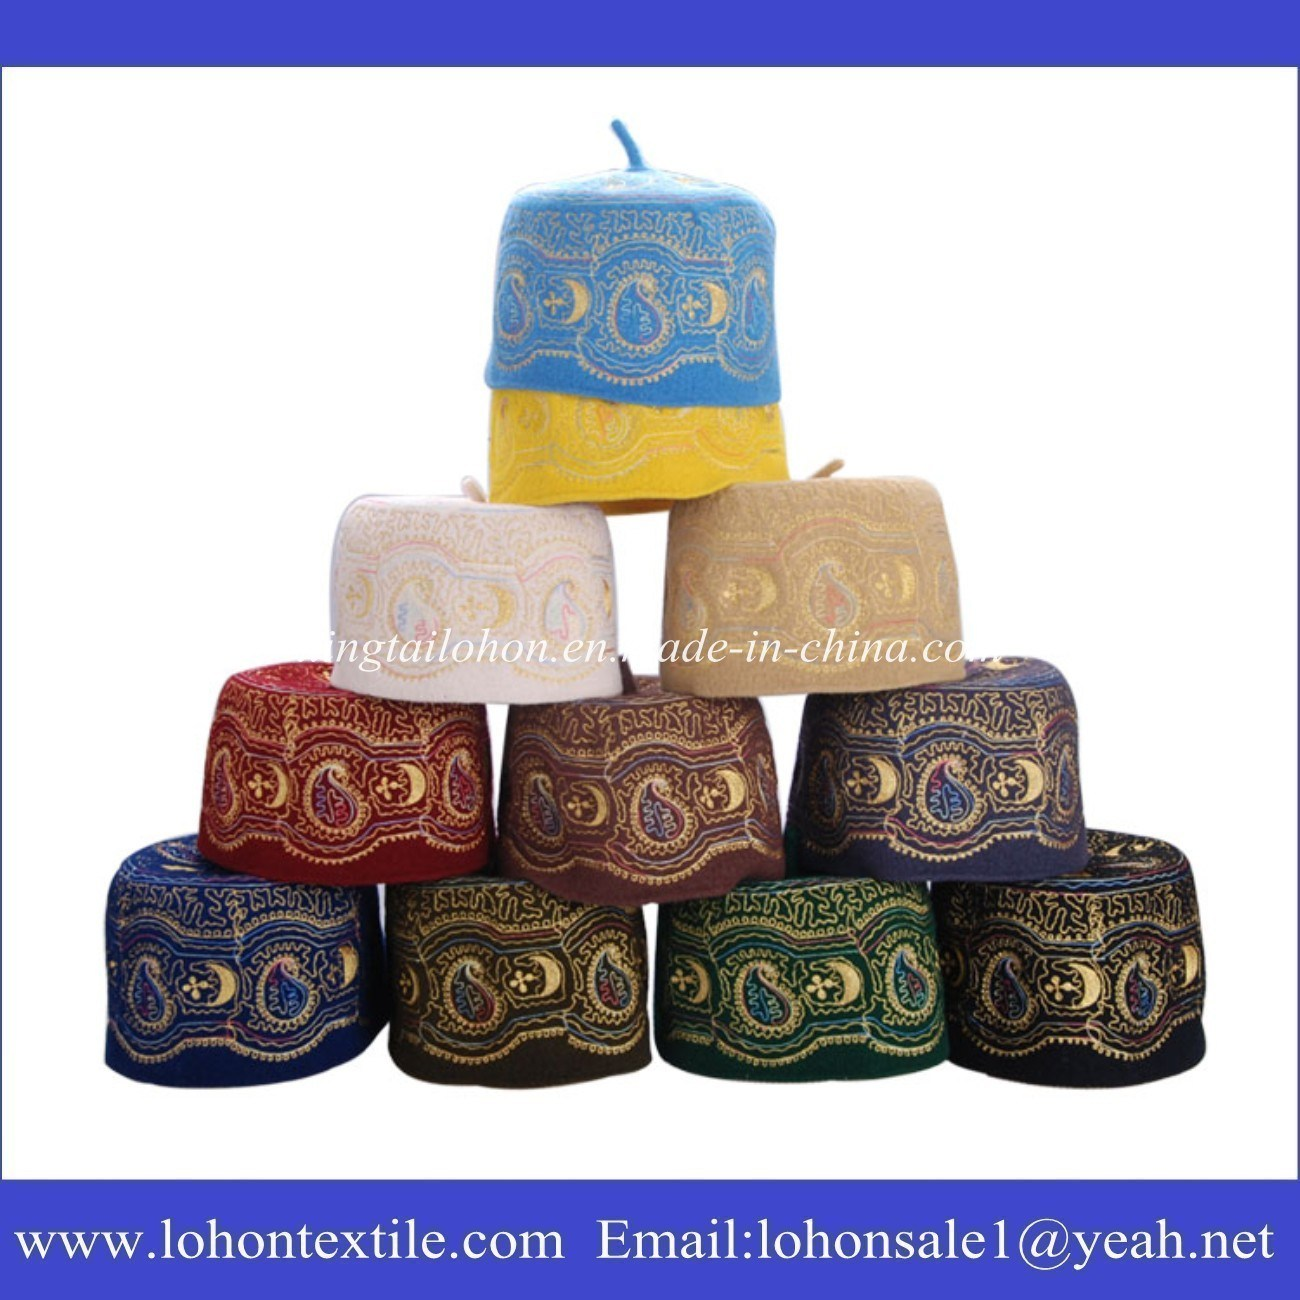 Islamic Hat Arab Turban Muslim Hat Made of Wool Felt Material Embroideried